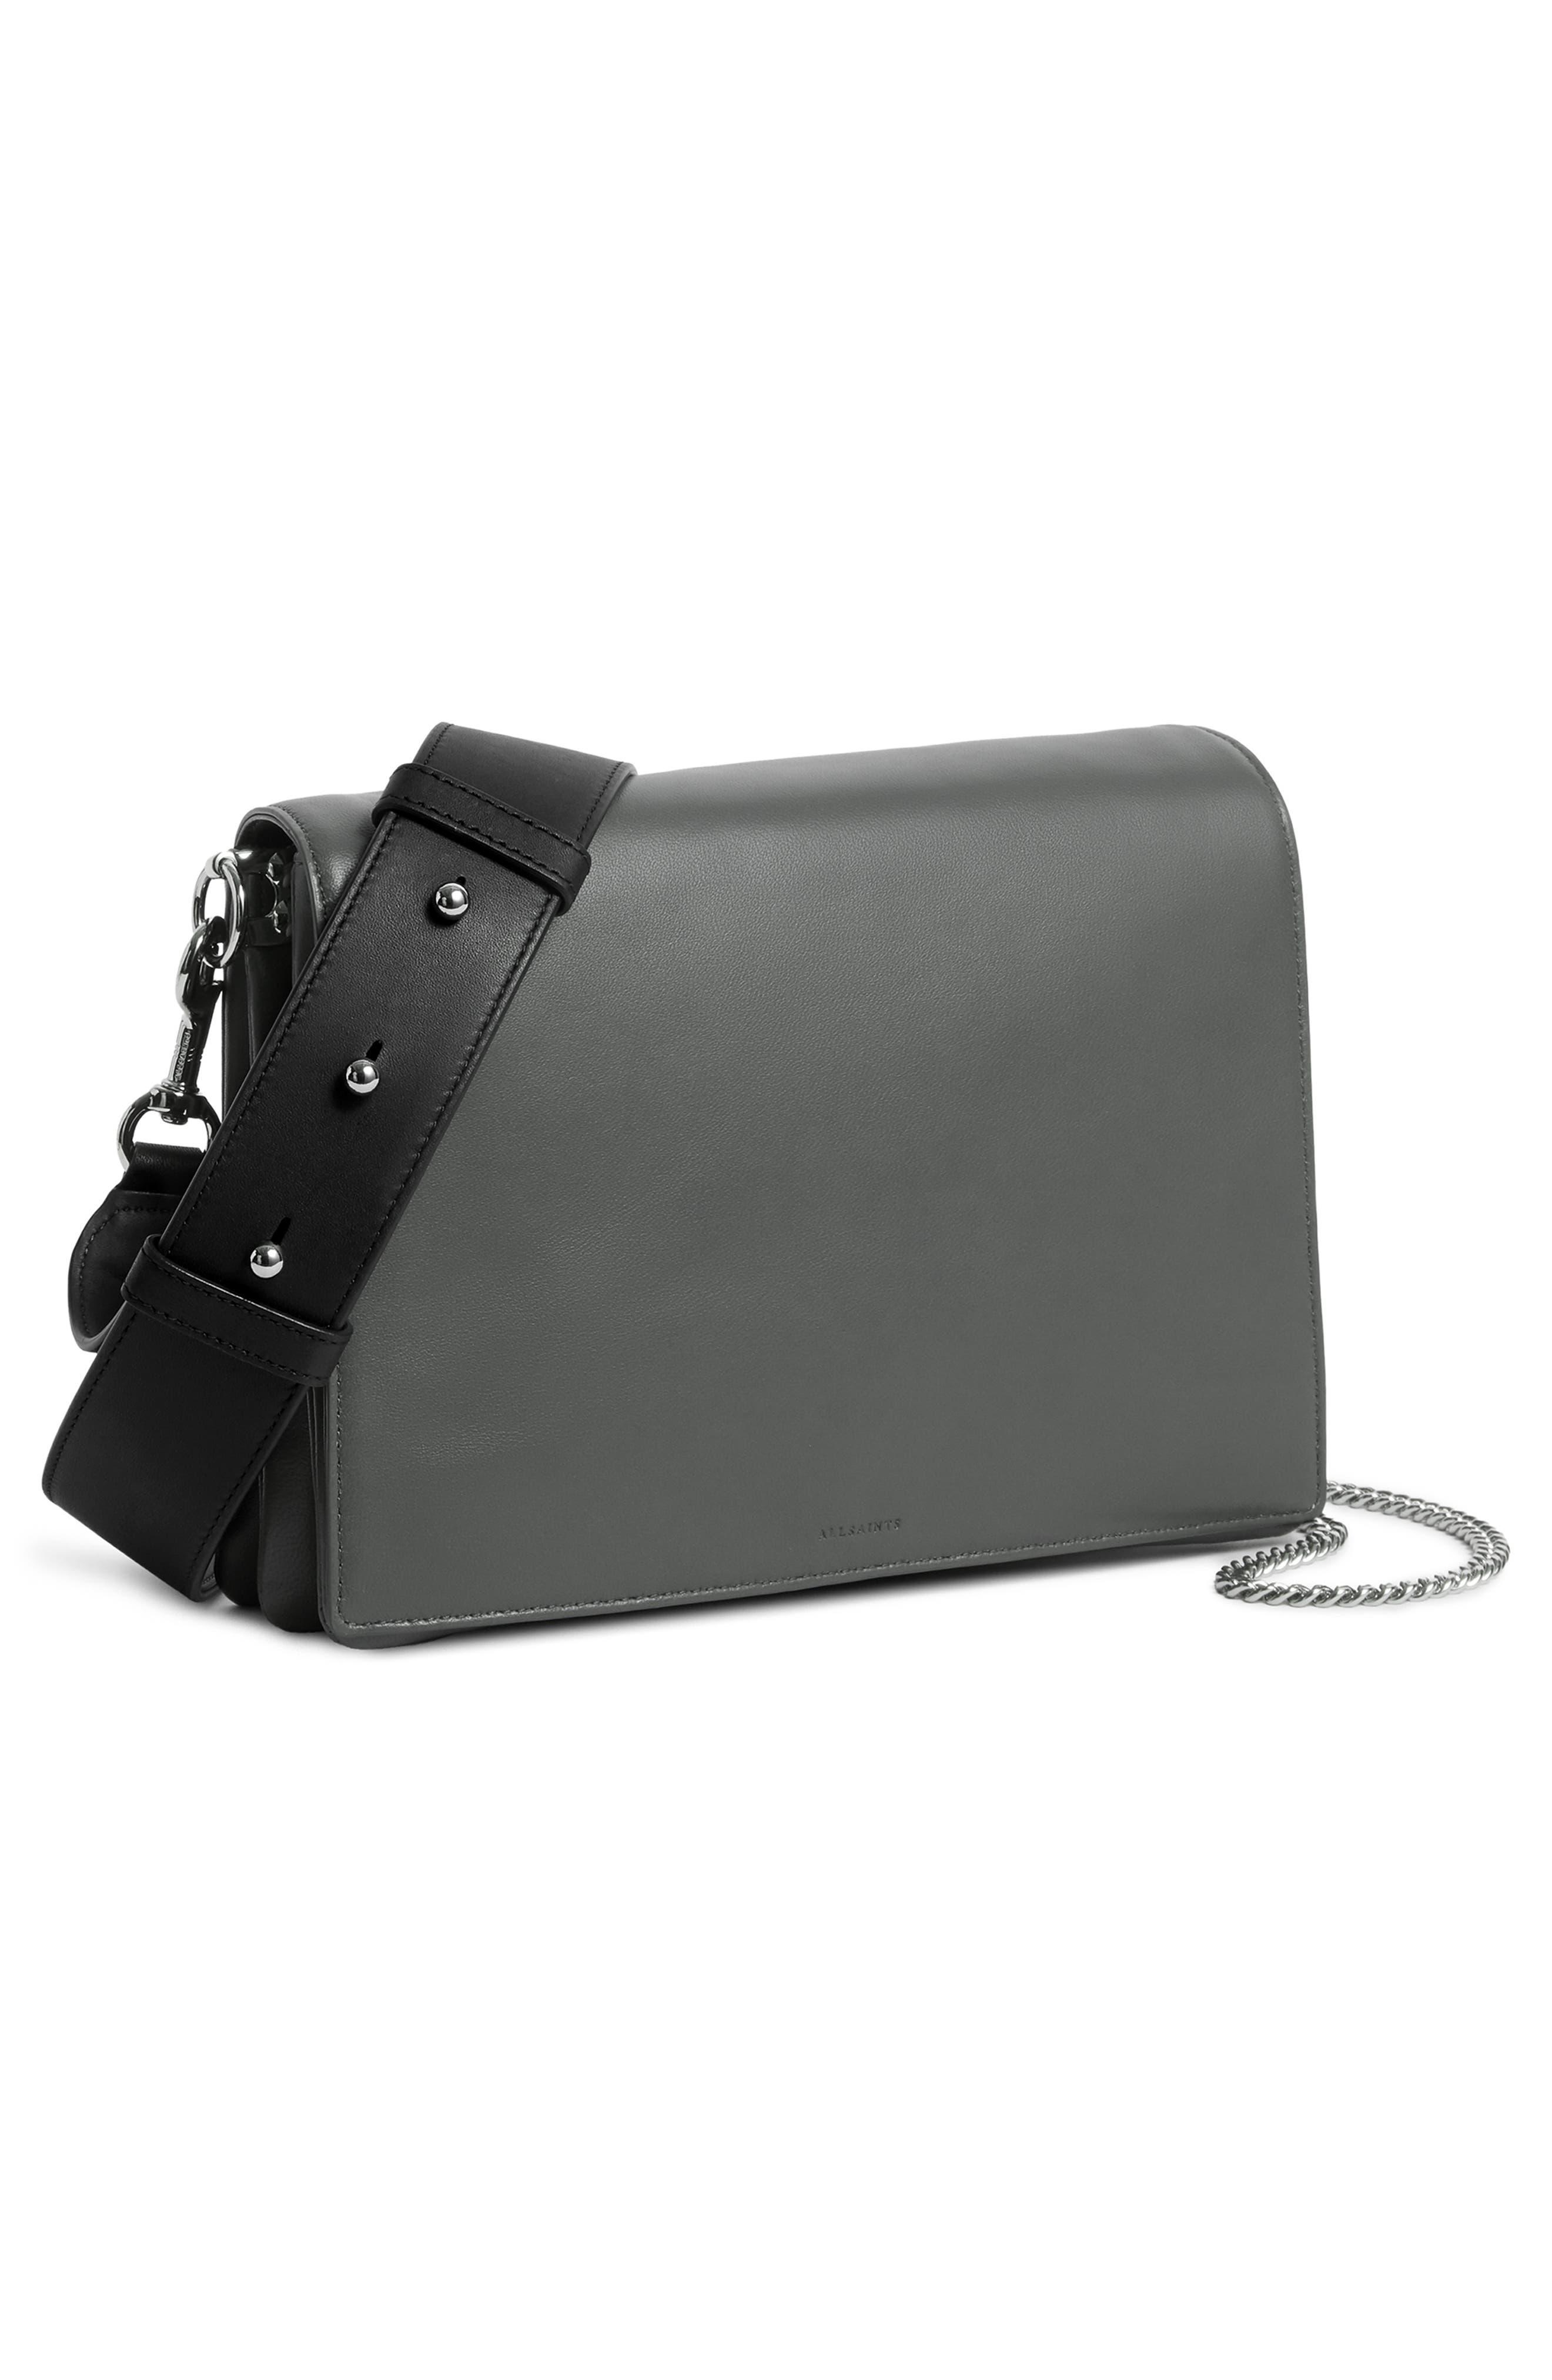 Zep Lambskin Leather Box Bag,                             Alternate thumbnail 8, color,                             SMOKY BLUE/ DARK BLUE